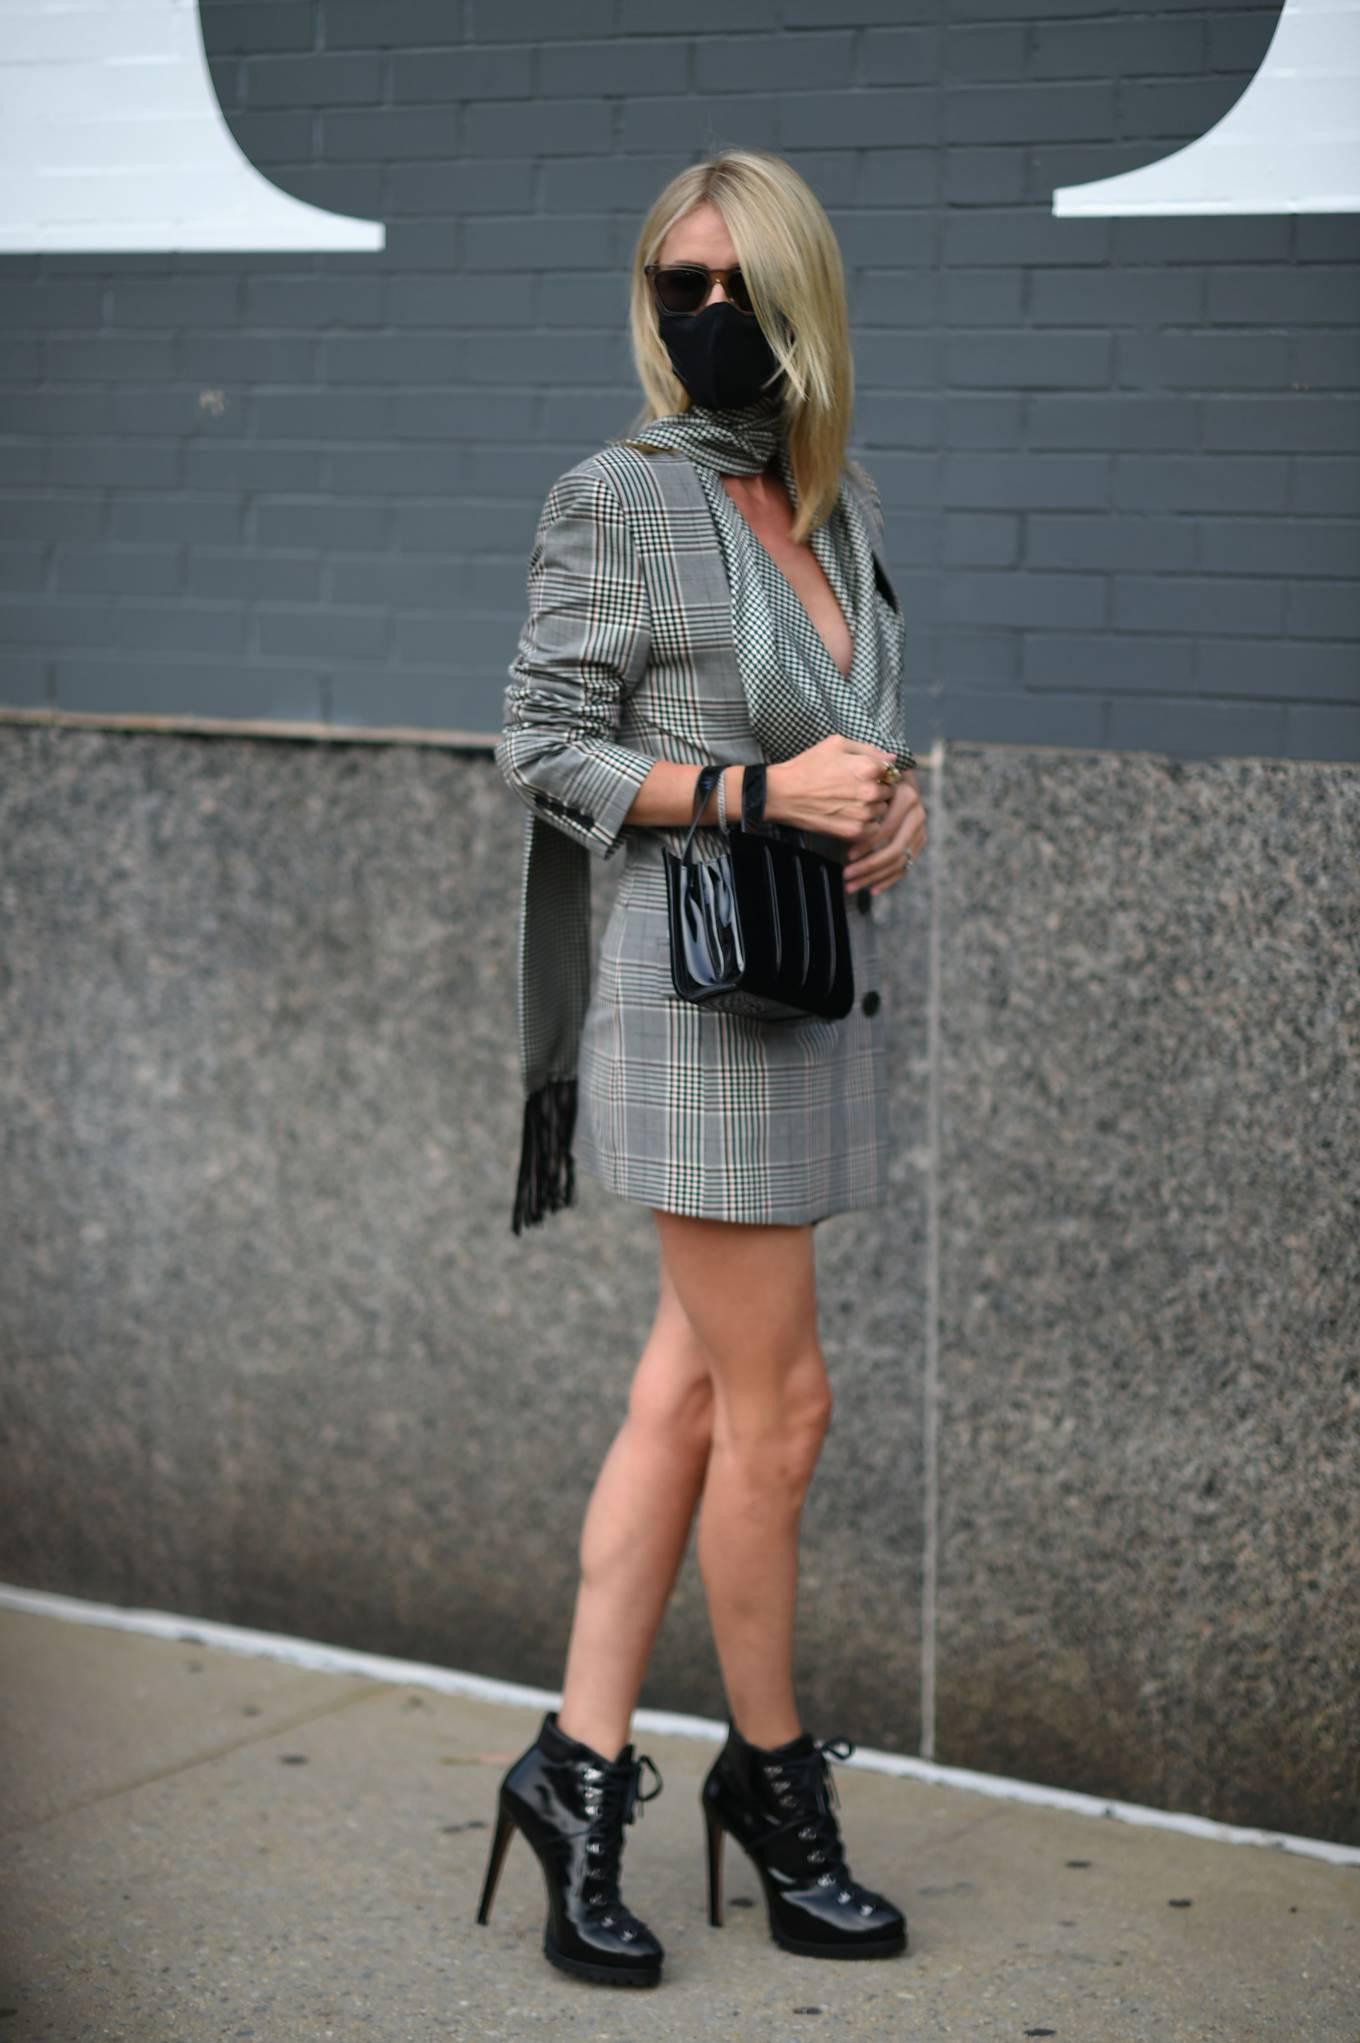 Nicky Hilton 2020 : Nicky Hilton – New York Fashion Week – Monse Fall-Winter 2020 Presentation-07